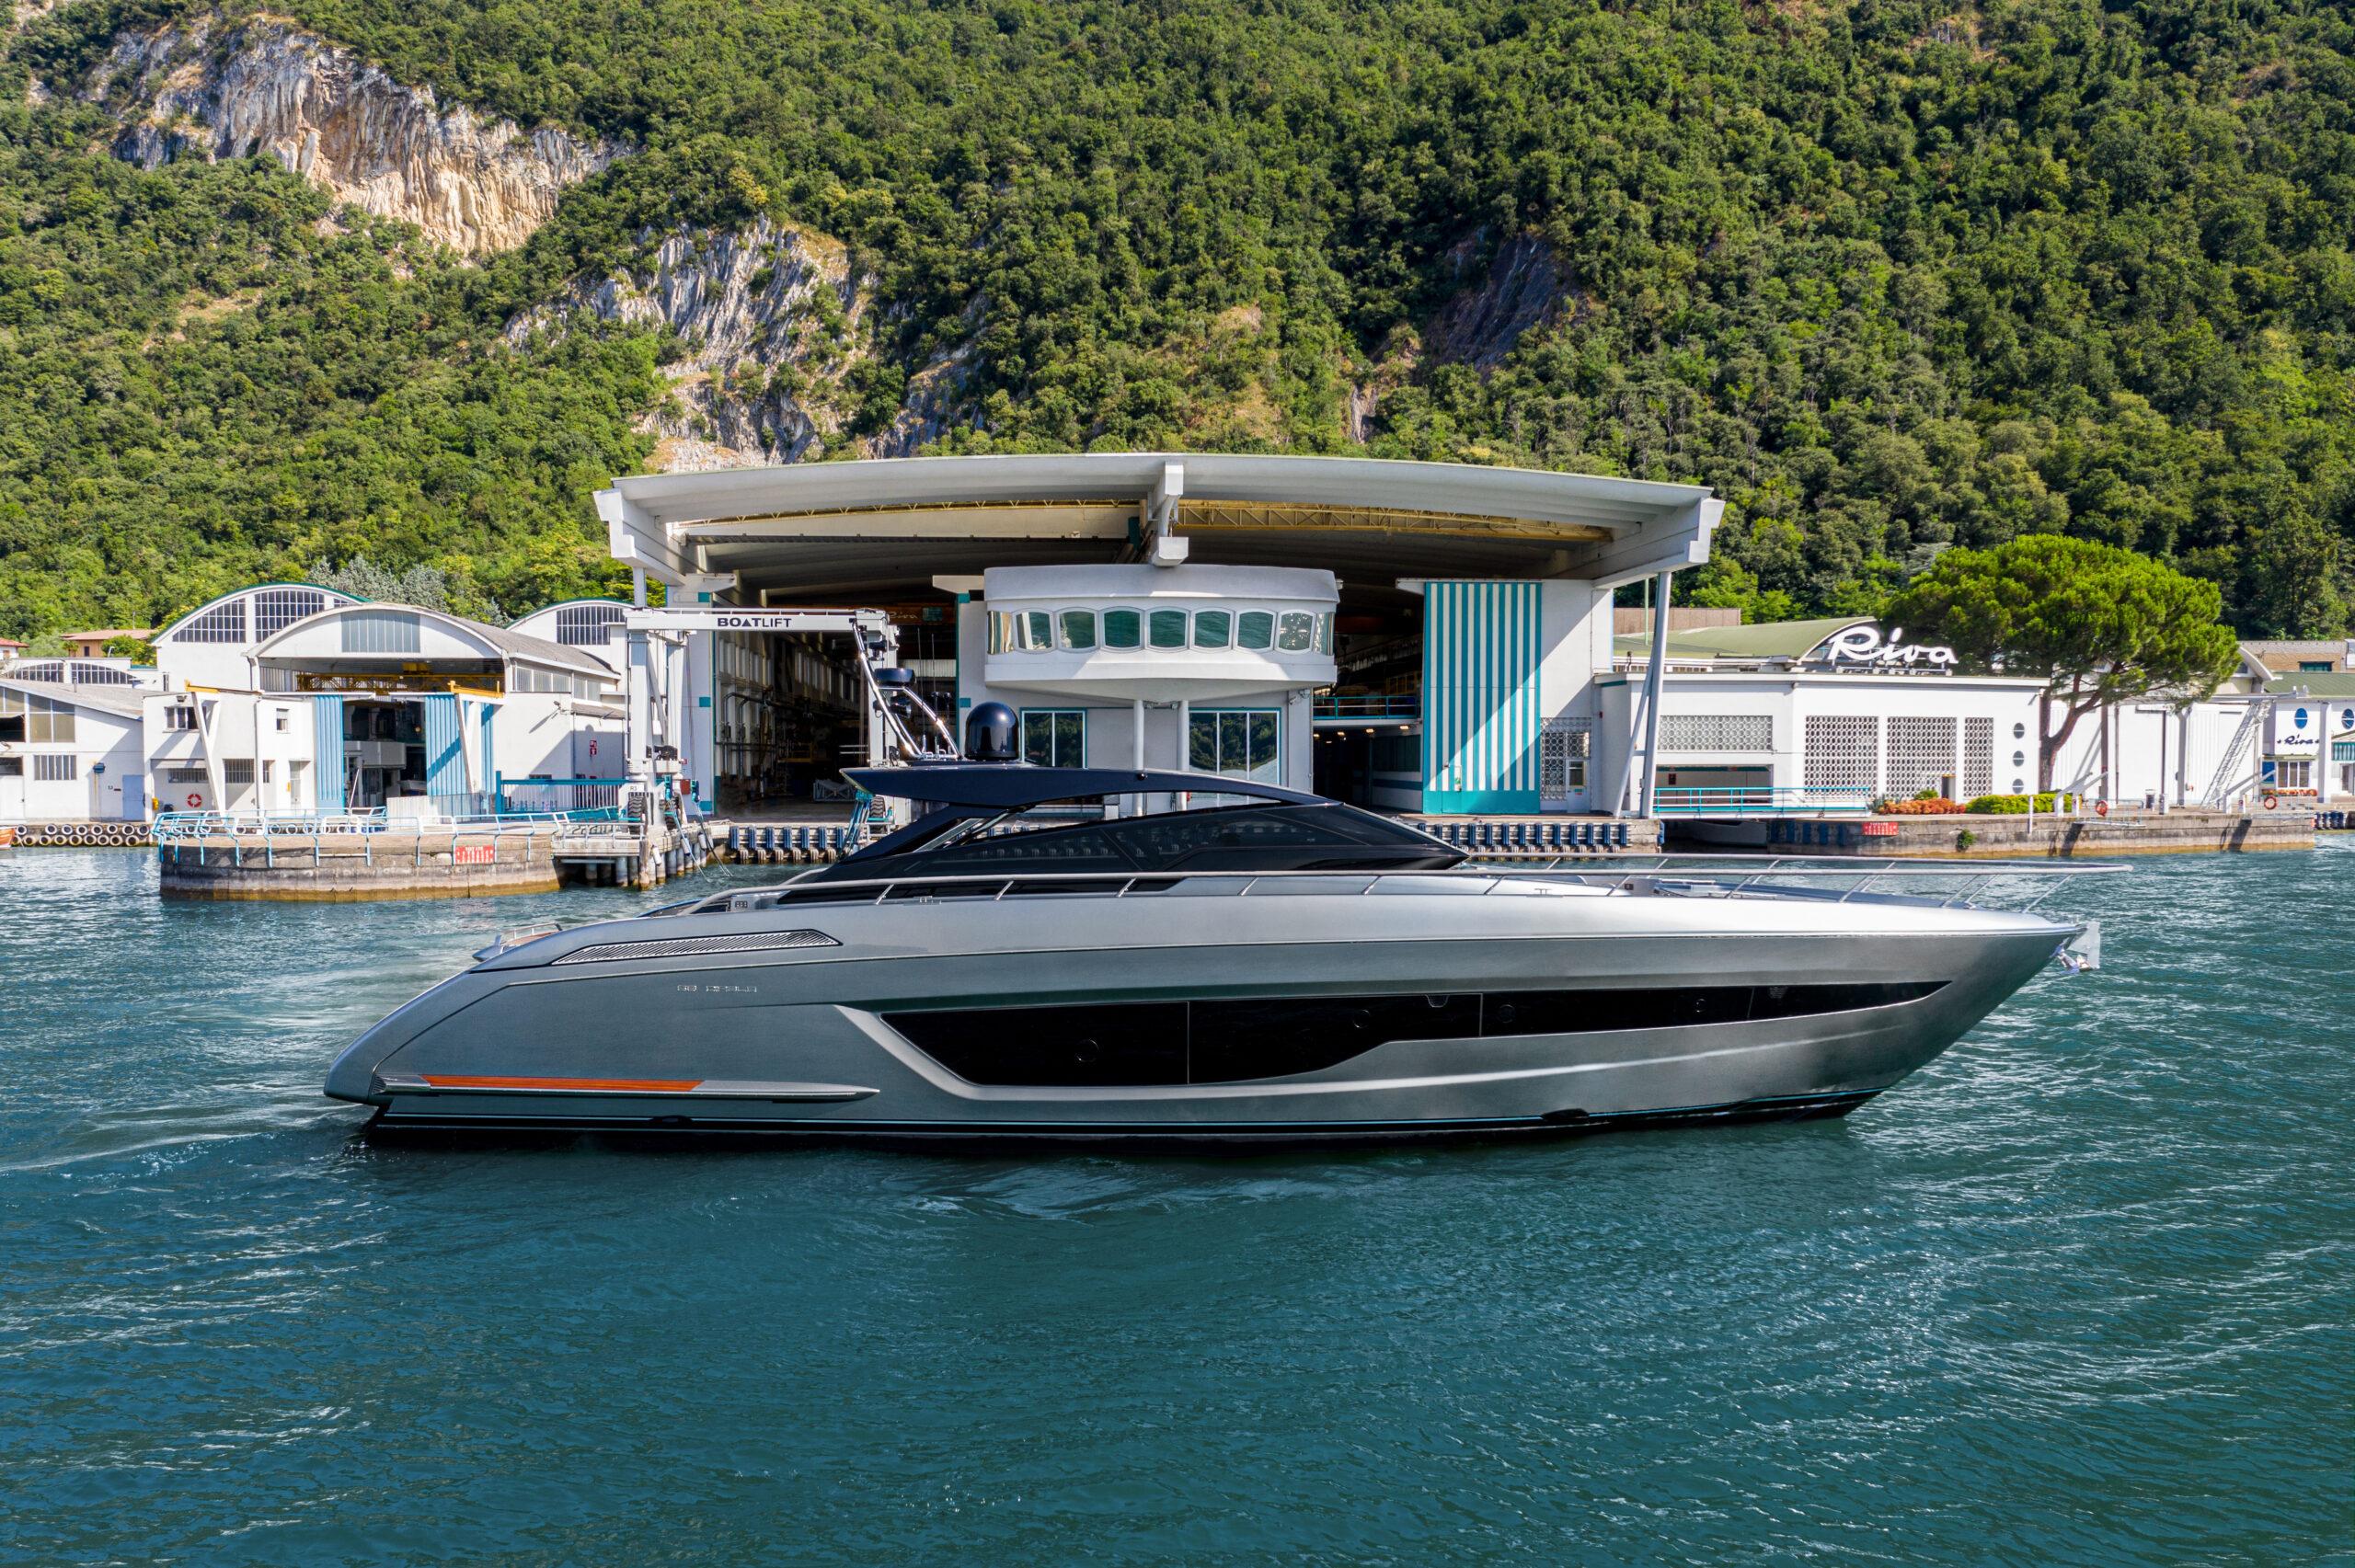 Riva 68 side profile on Lake Iseo